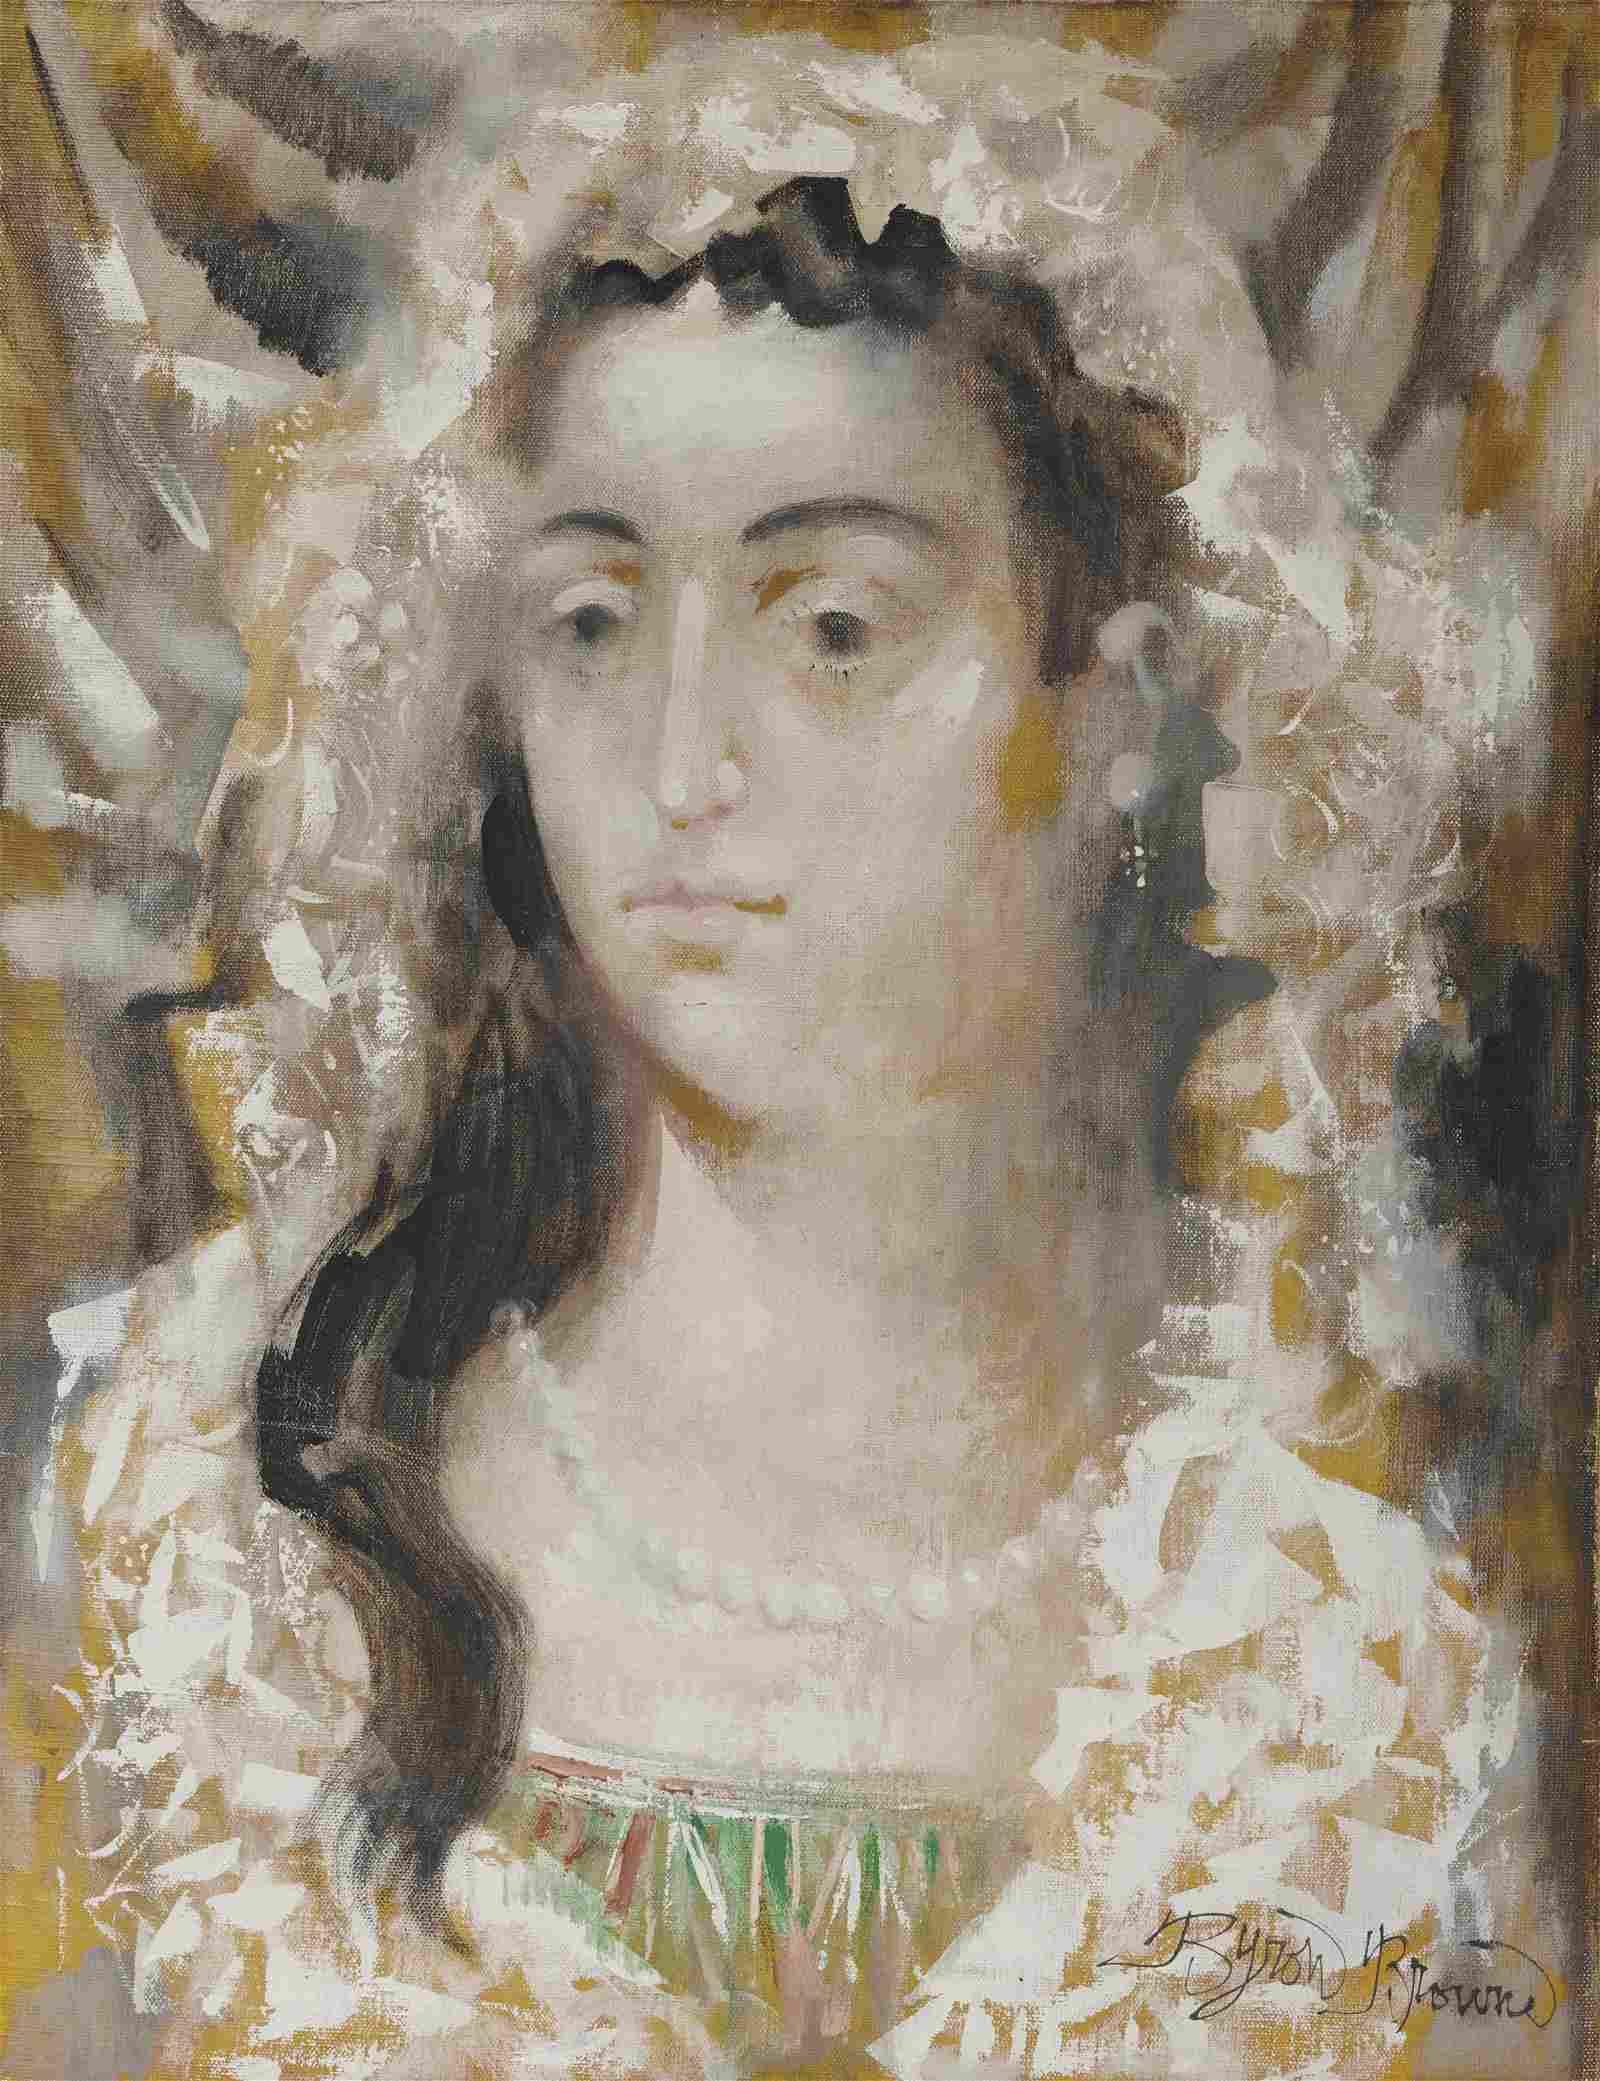 BYRON BROWNE, (American, 1907-1961), The Bride, 1960,